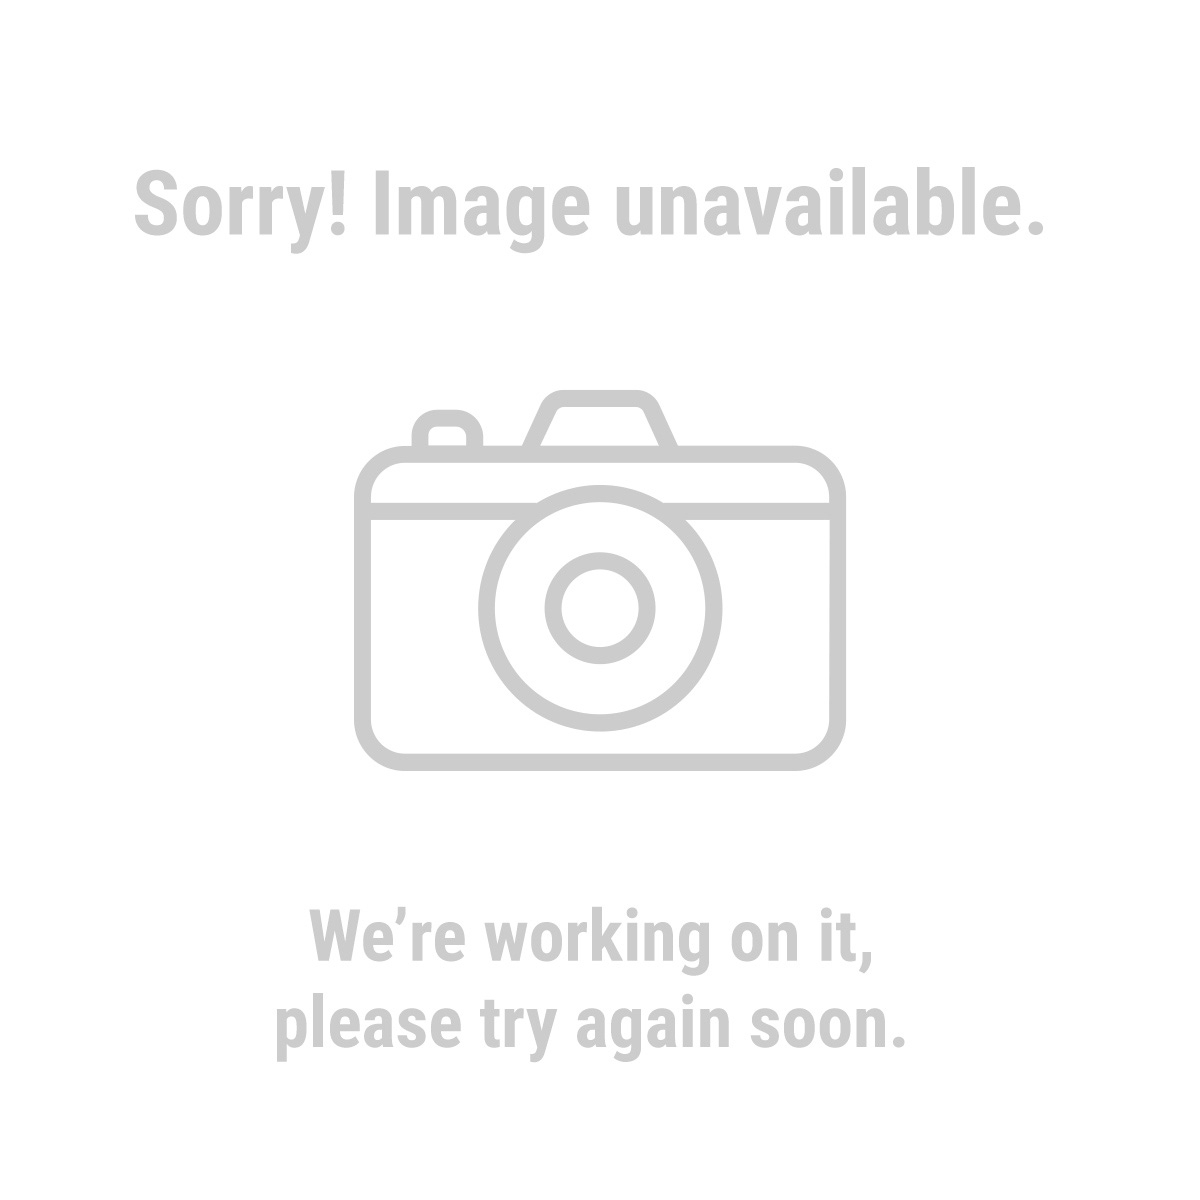 Harbor Freight Utility Cart >> Polypropylene Plastic Service Cart 24 X 36